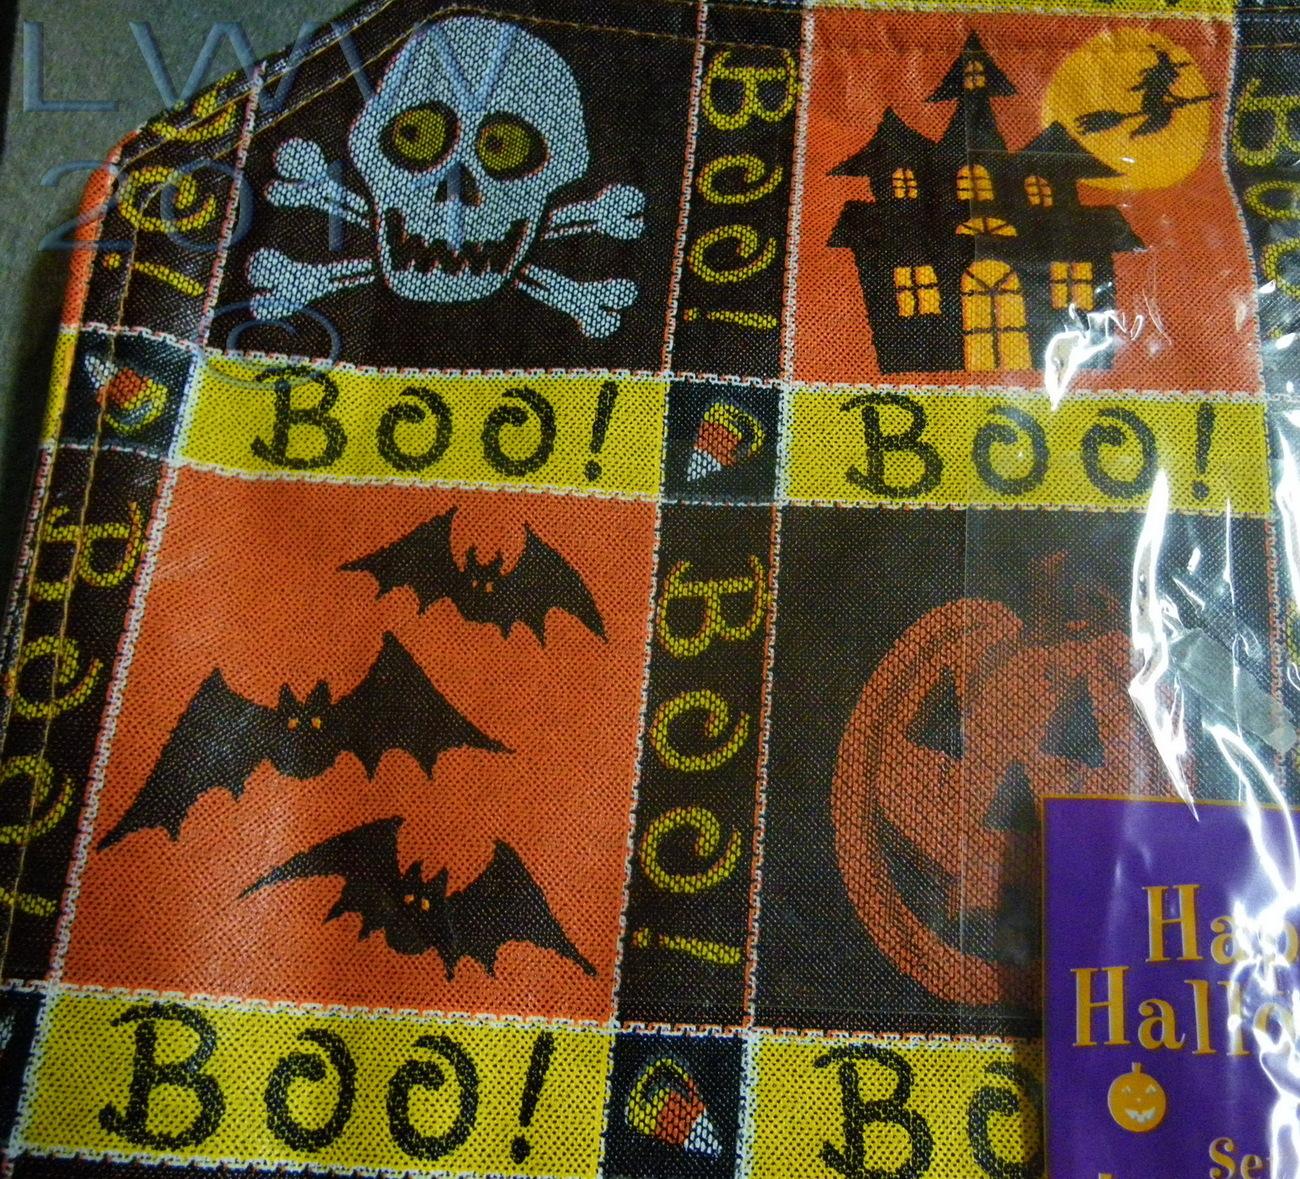 Set of 4 Halloween Placemats Skull Crossbones Bats Spider Ghost Jack-o-lantern